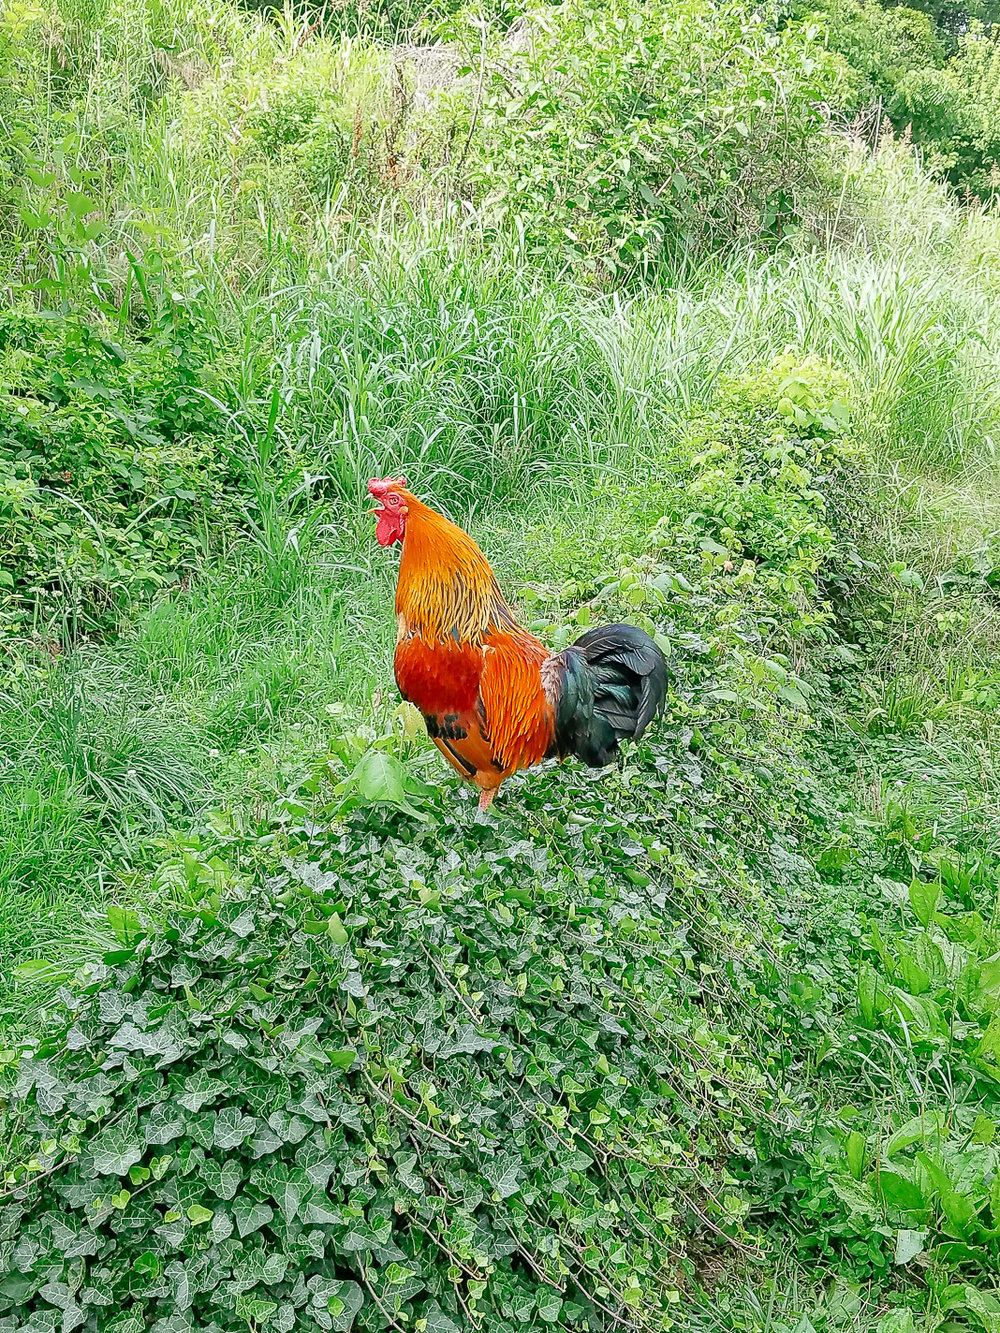 Rooster-AT-Plumbing-Roanoke-Virginia